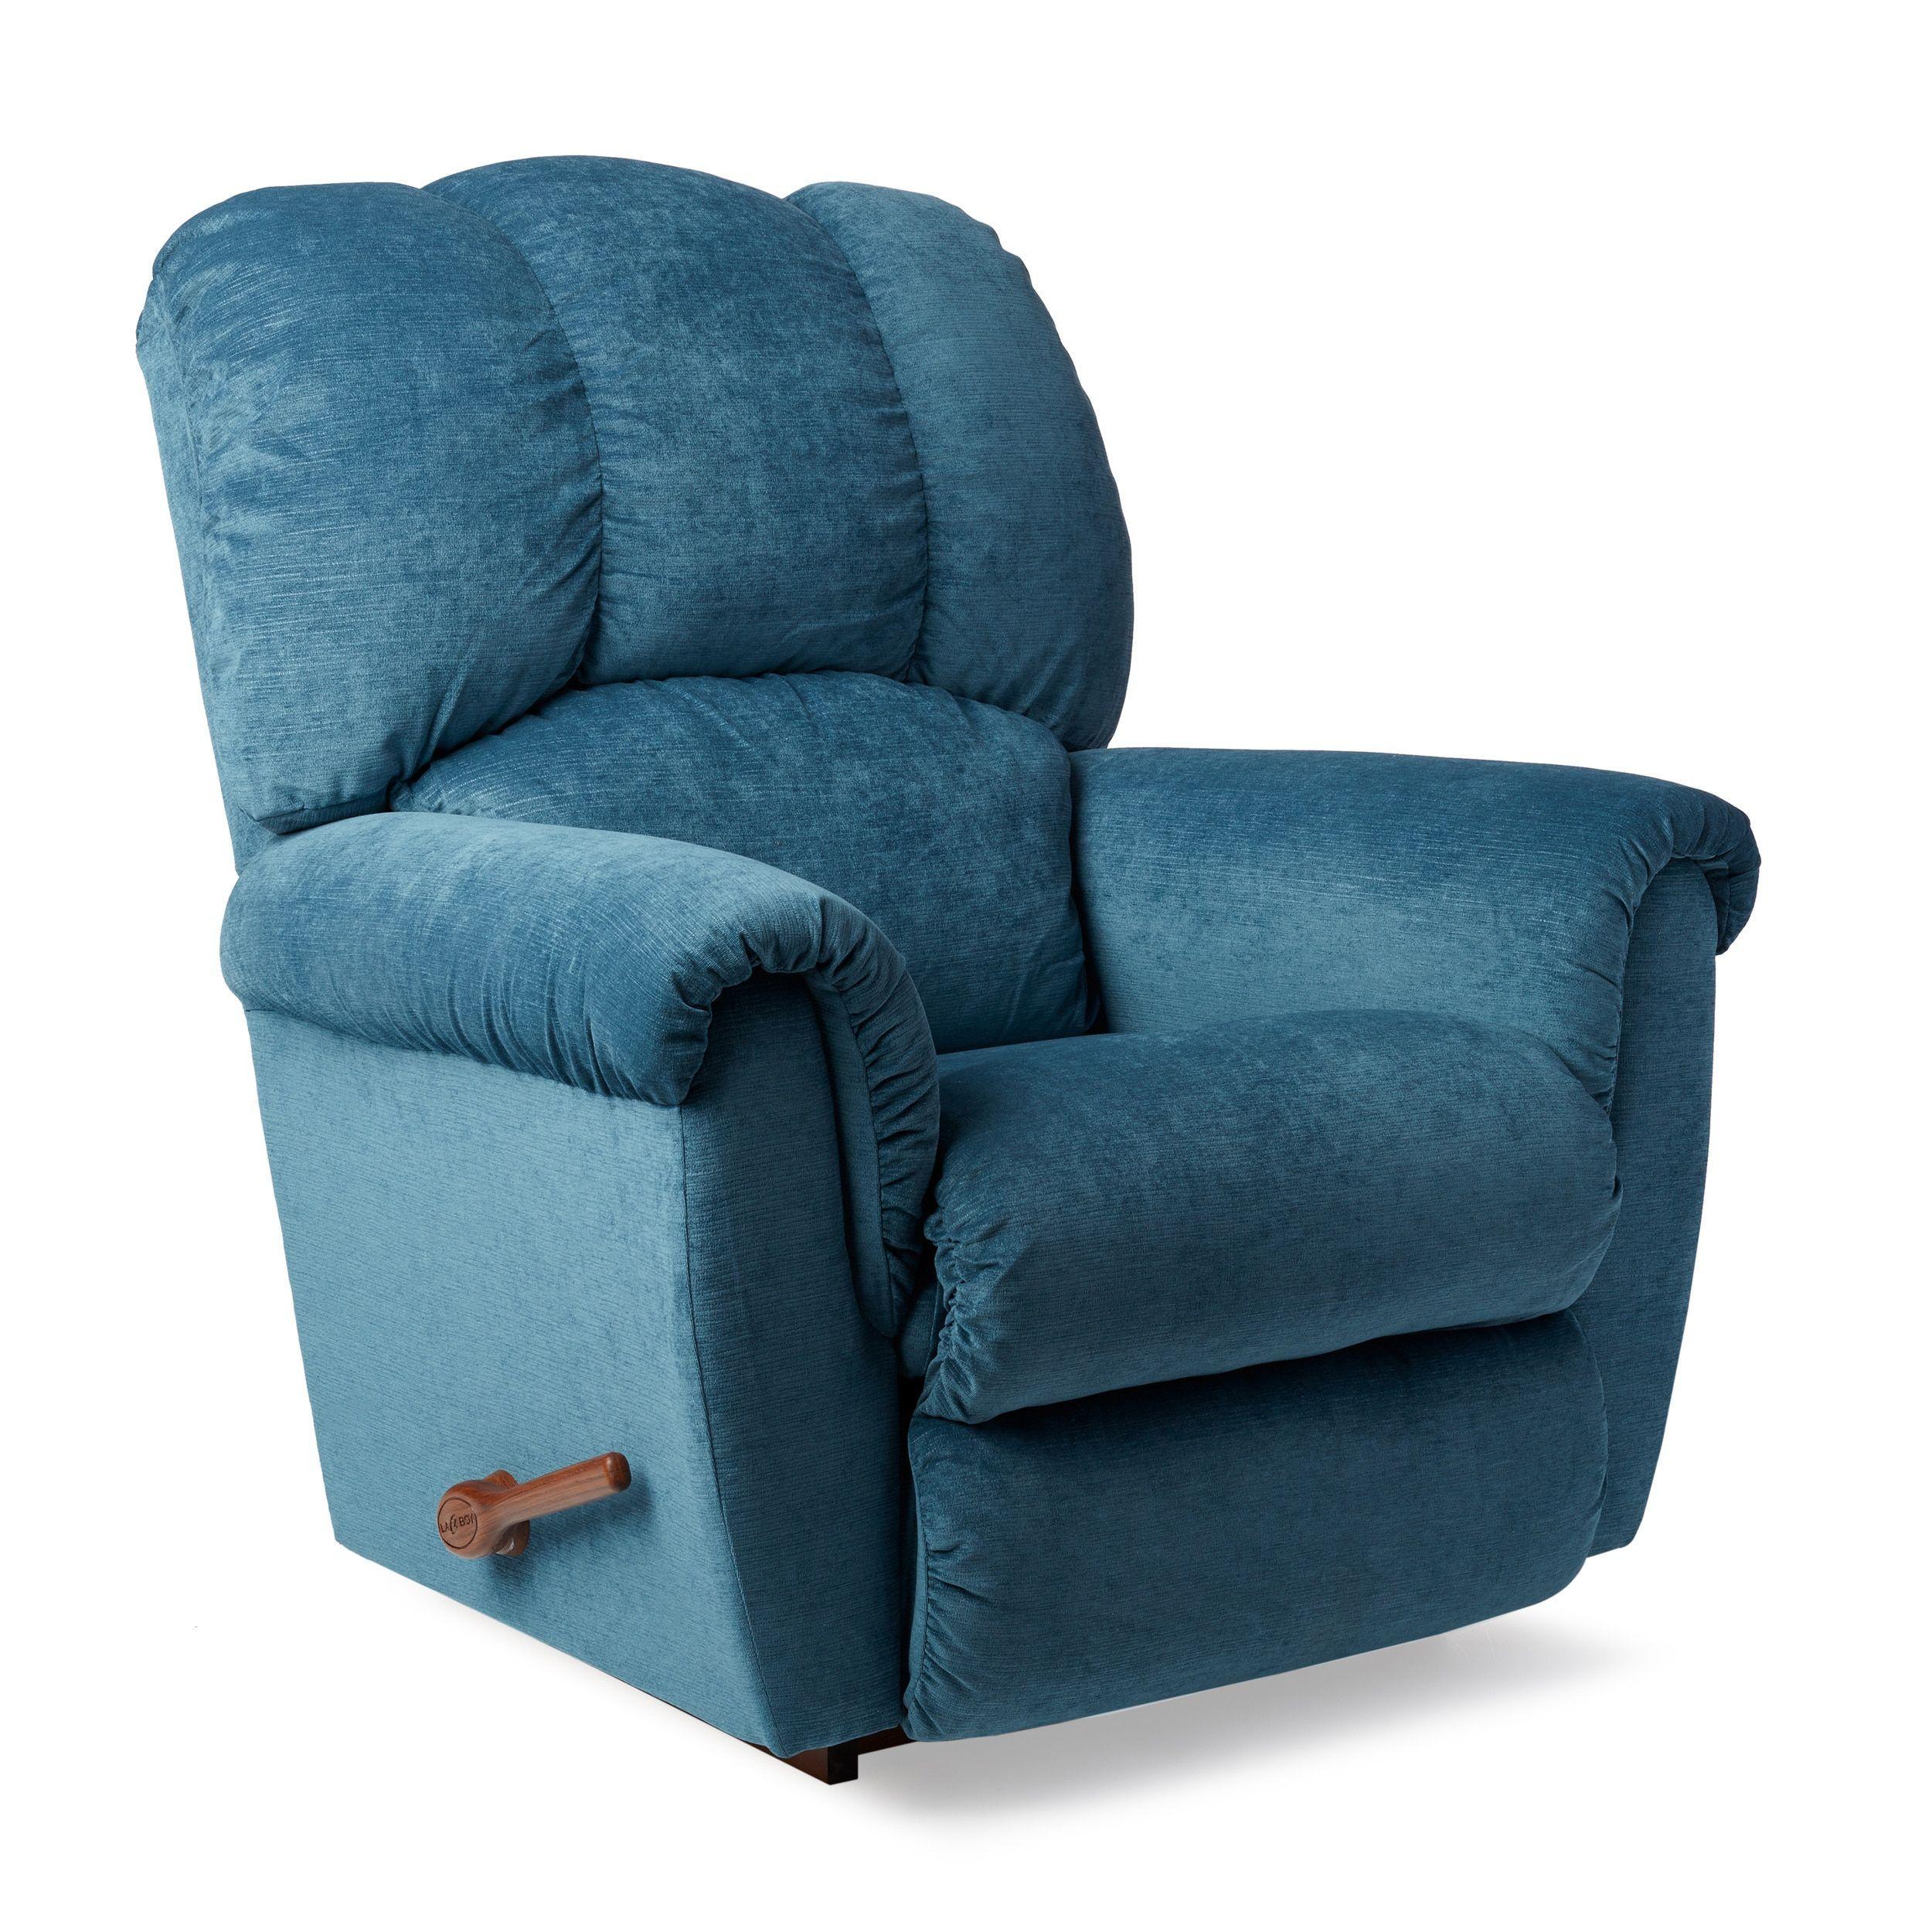 Fabulous La Z Boy Connor Teal Blue Recliner Size Standard Metal Evergreenethics Interior Chair Design Evergreenethicsorg